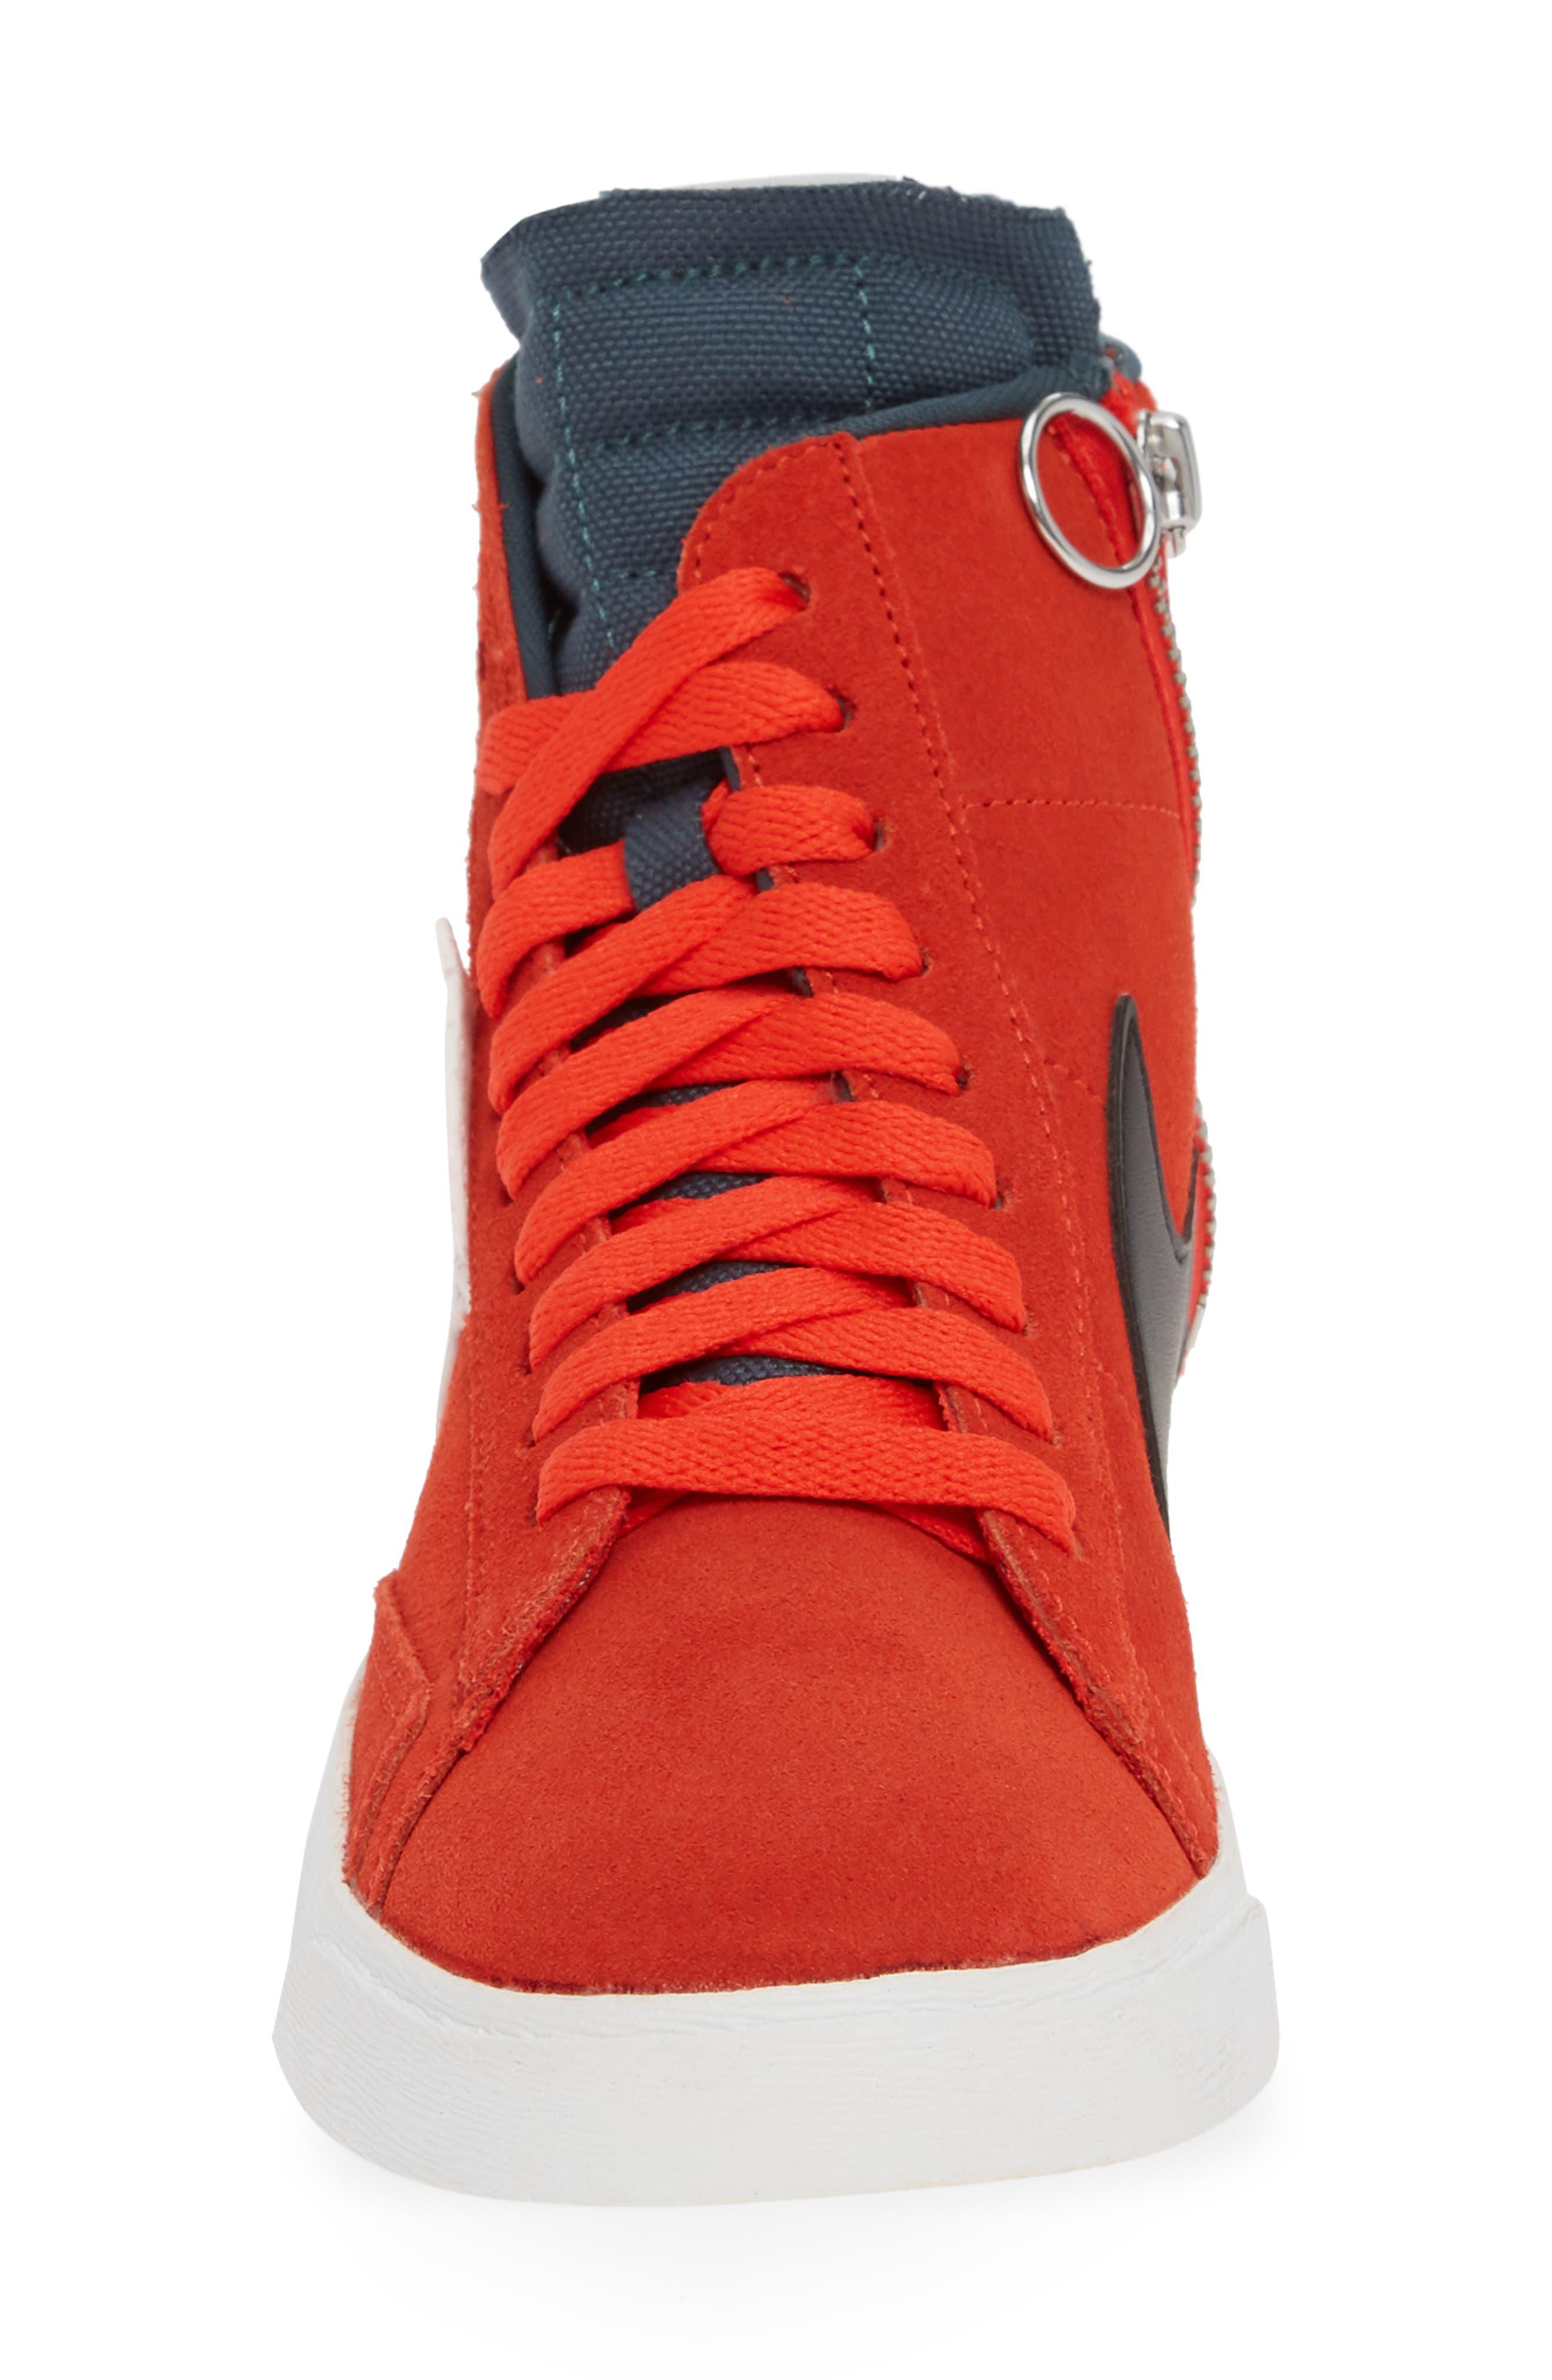 Blazer Mid Rebel Sneaker,                             Alternate thumbnail 4, color,                             HABANERO/ WHITE/ BLACK/ SPRUCE